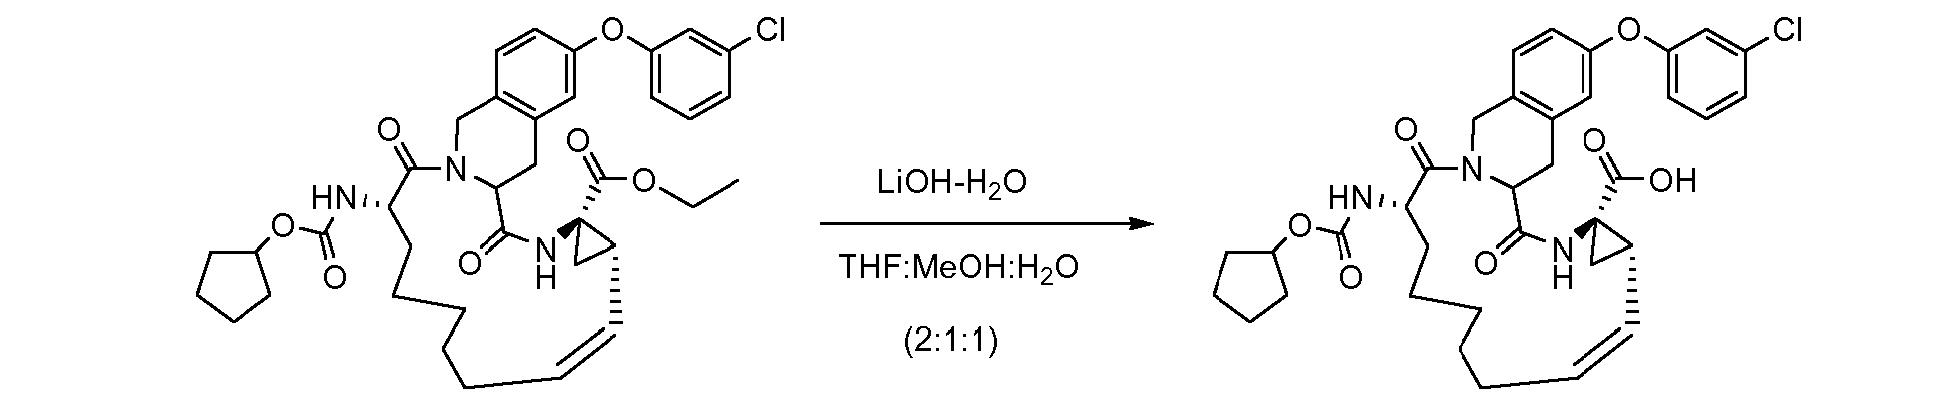 Figure imgb0579